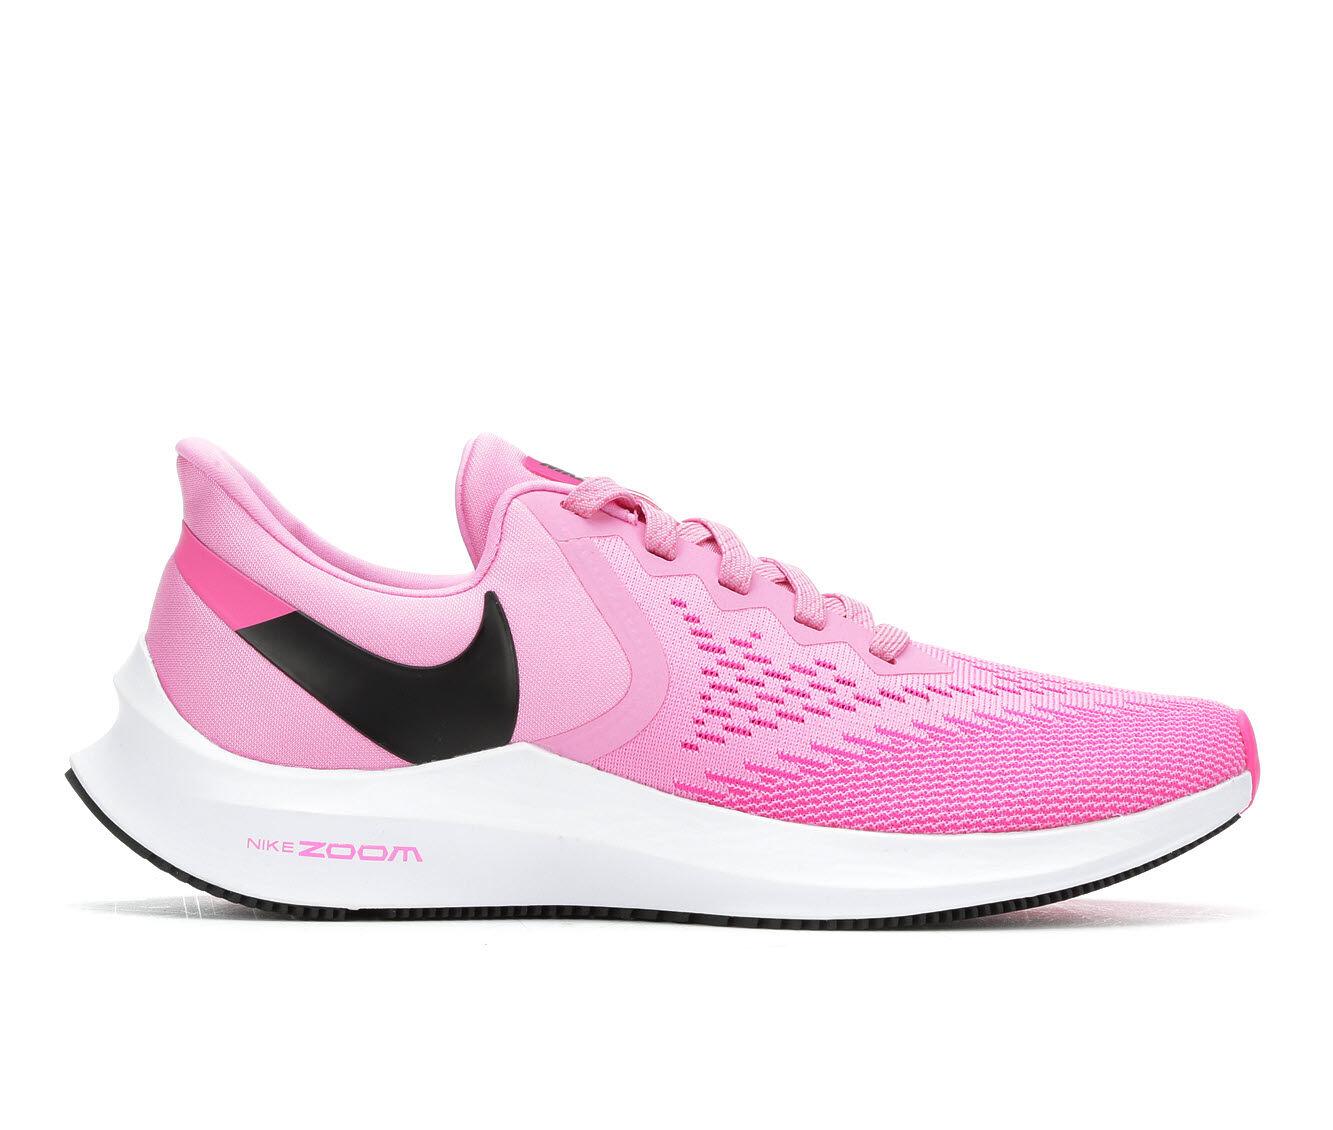 Women's Nike Zoom Winflo 6 Running Shoes Fuchsia/Wht/Blk